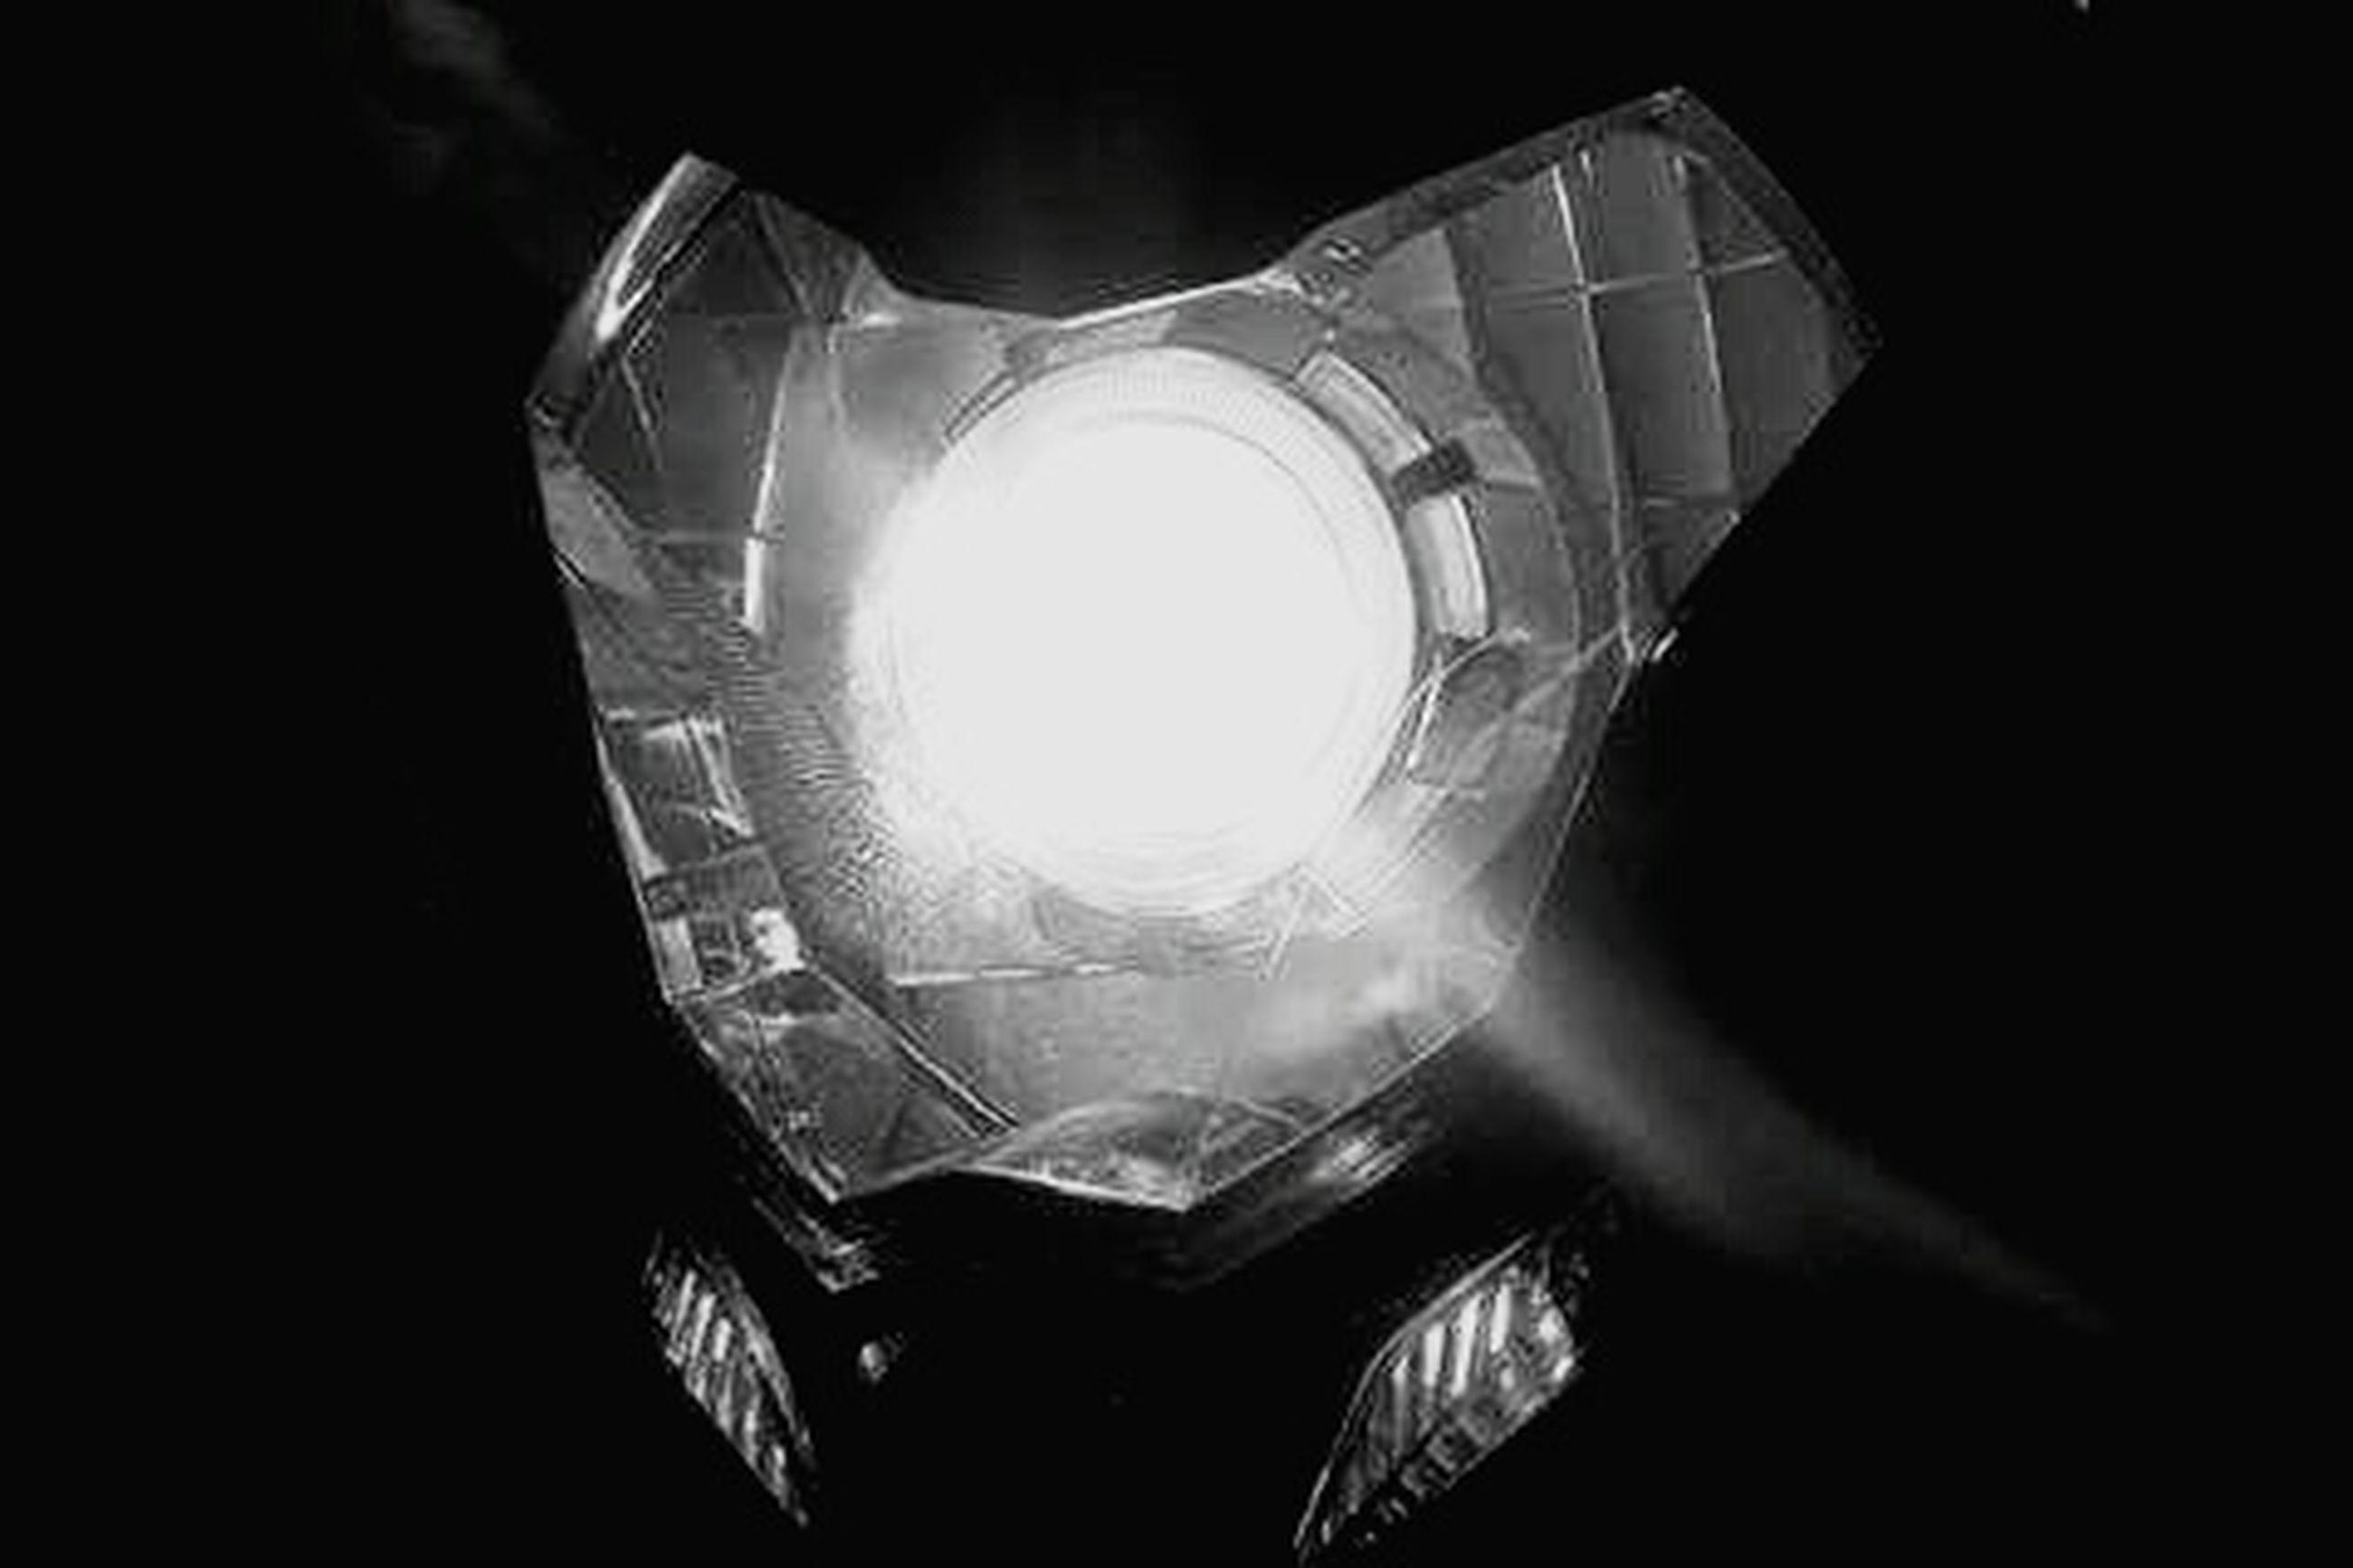 lighting equipment, light bulb, single object, illuminated, electricity, no people, close-up, black background, studio shot, filament, indoors